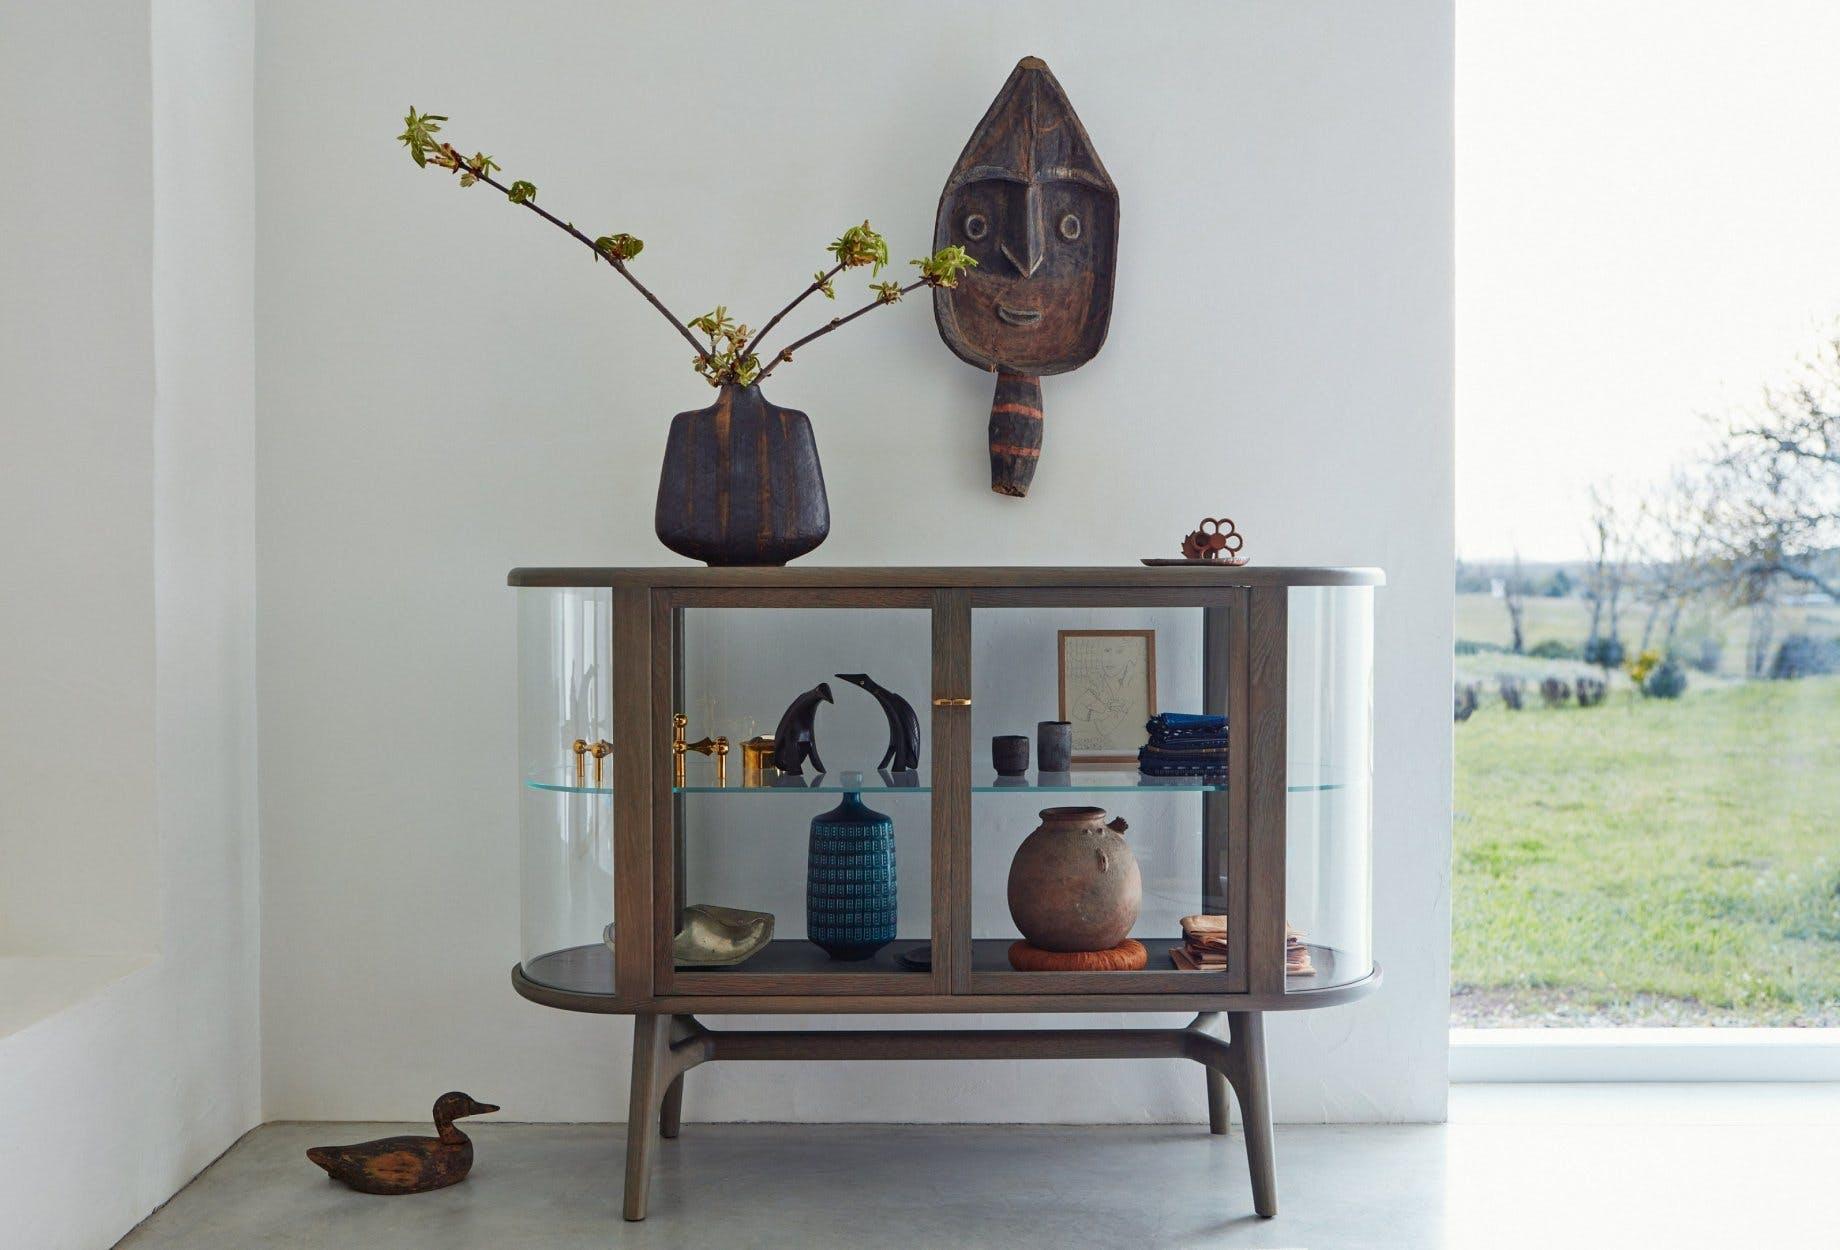 De-la-espada-neri-hu-solo-vitrine-sideboard-insitu-haute-living